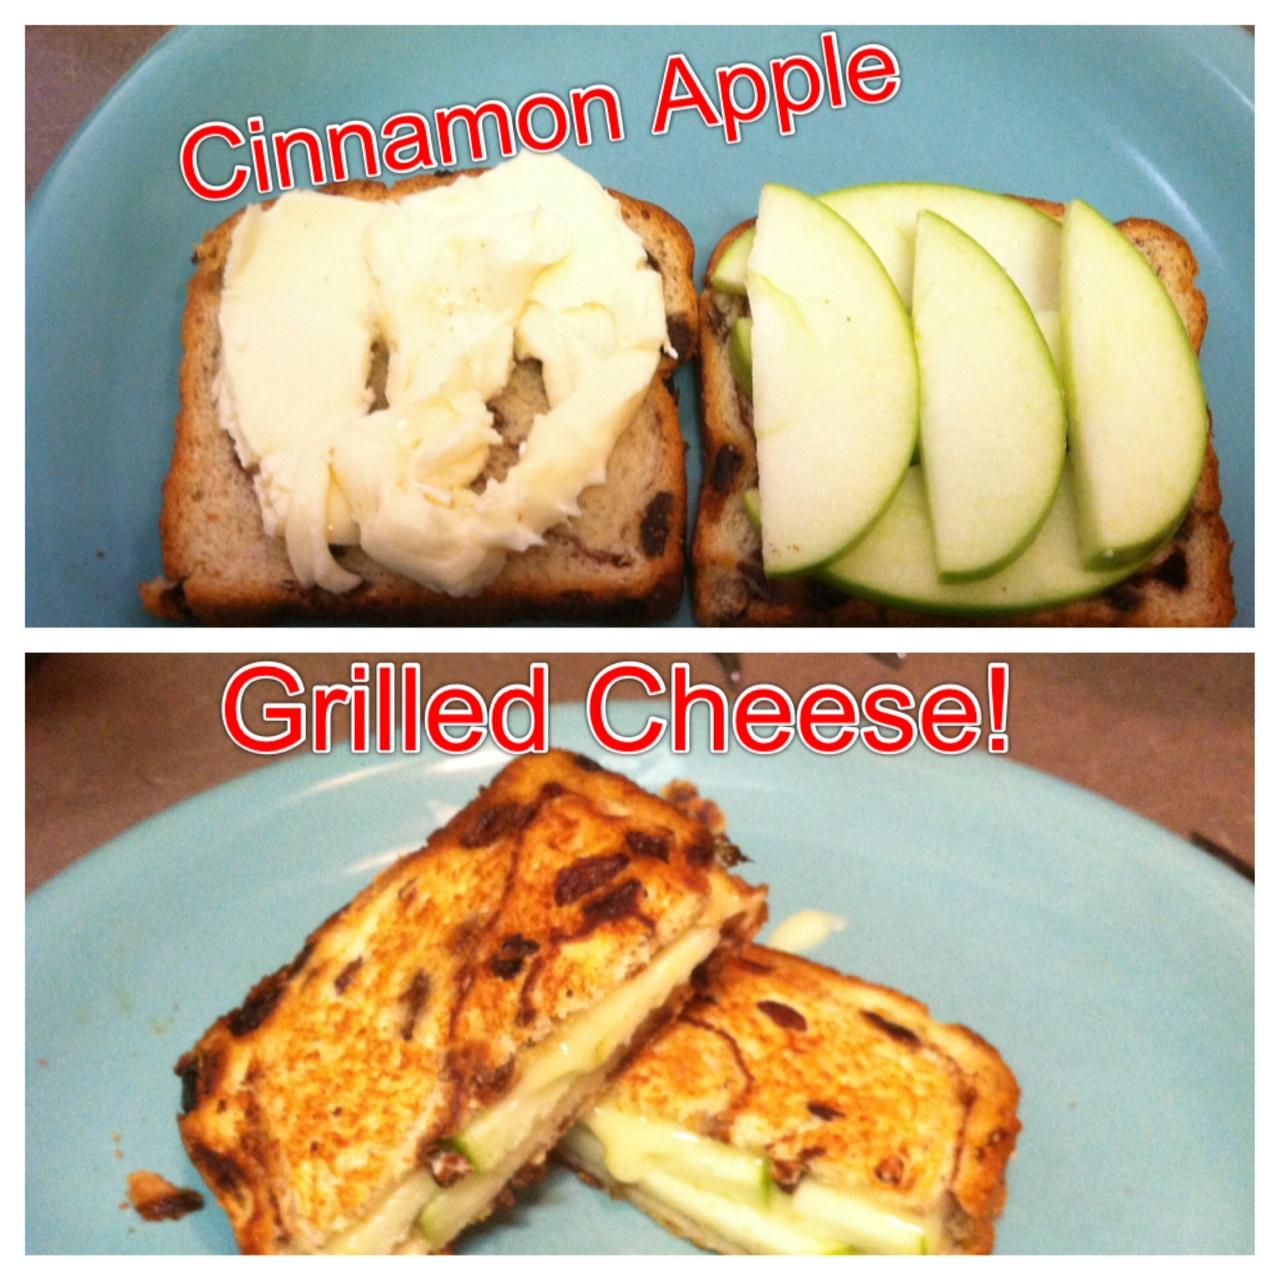 unBearablyGood: Cinnamon Apple Grilled Cheese!